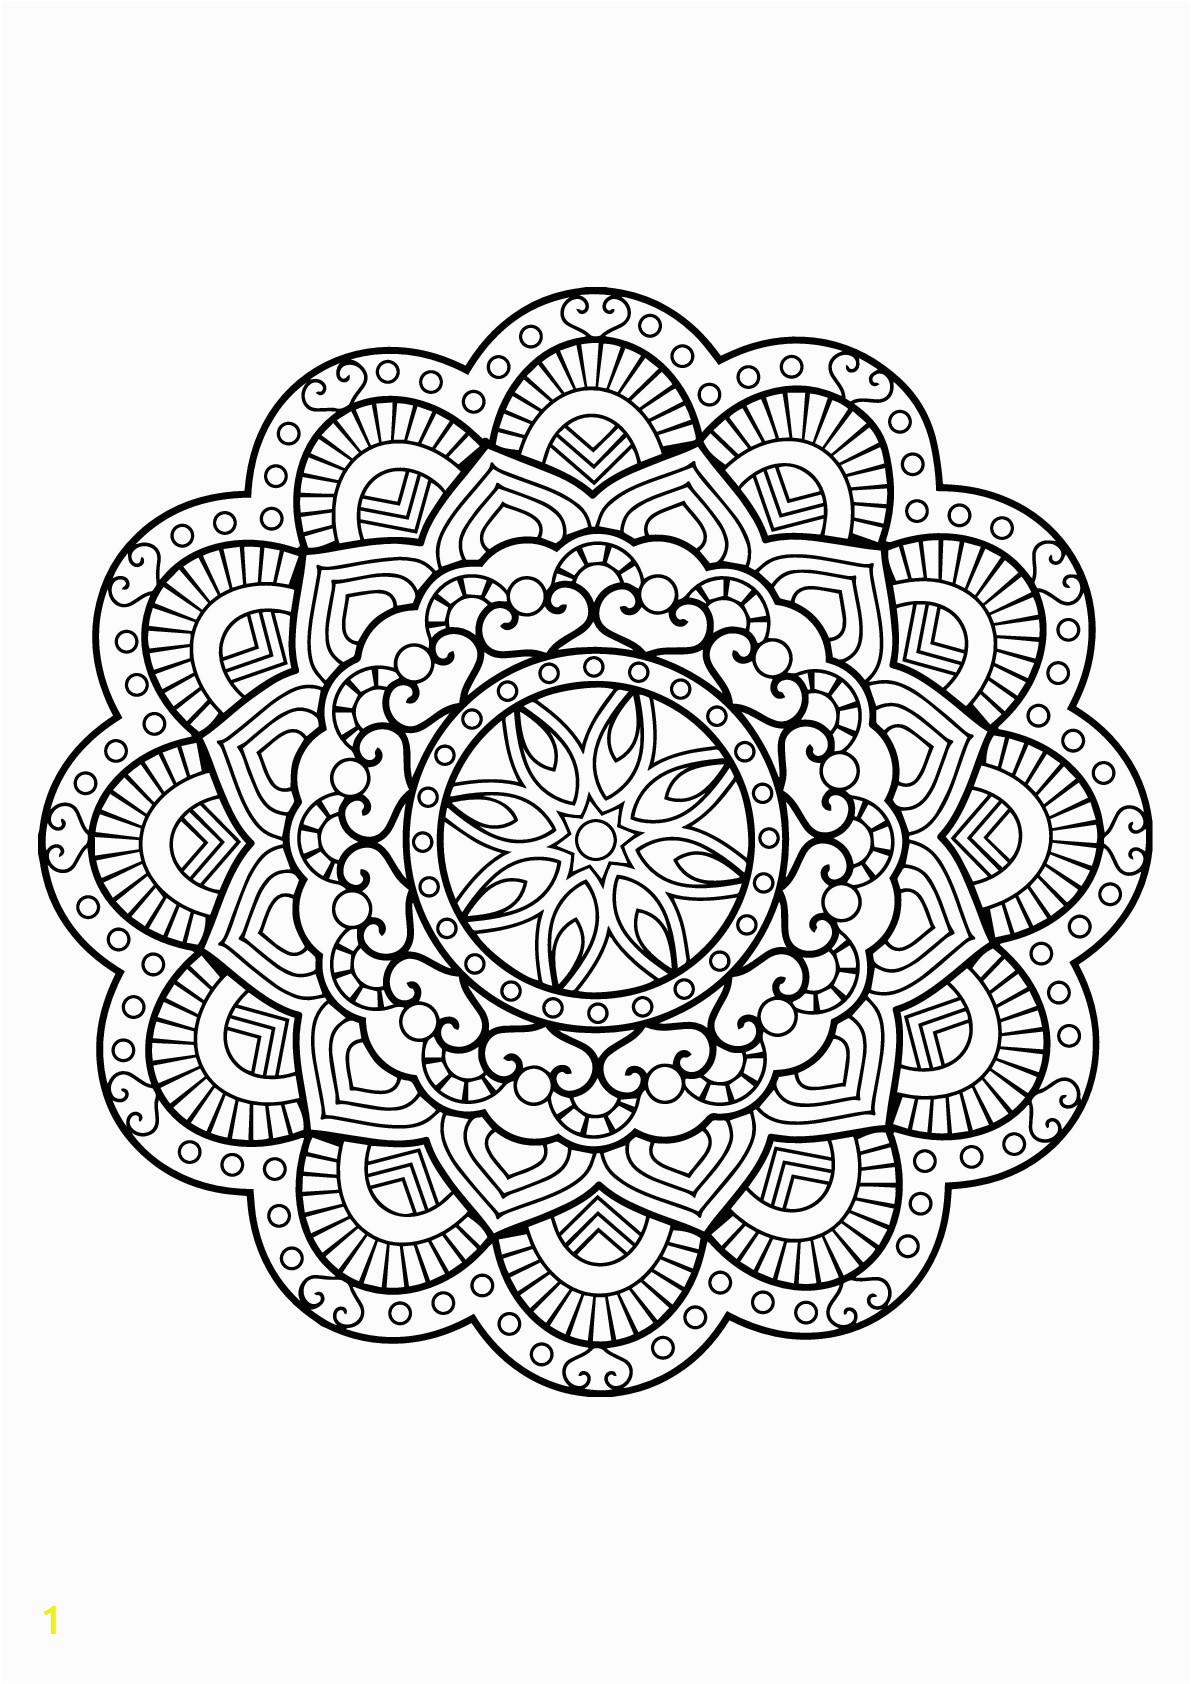 image=mandalas mandala from free coloring book for adults 26 1